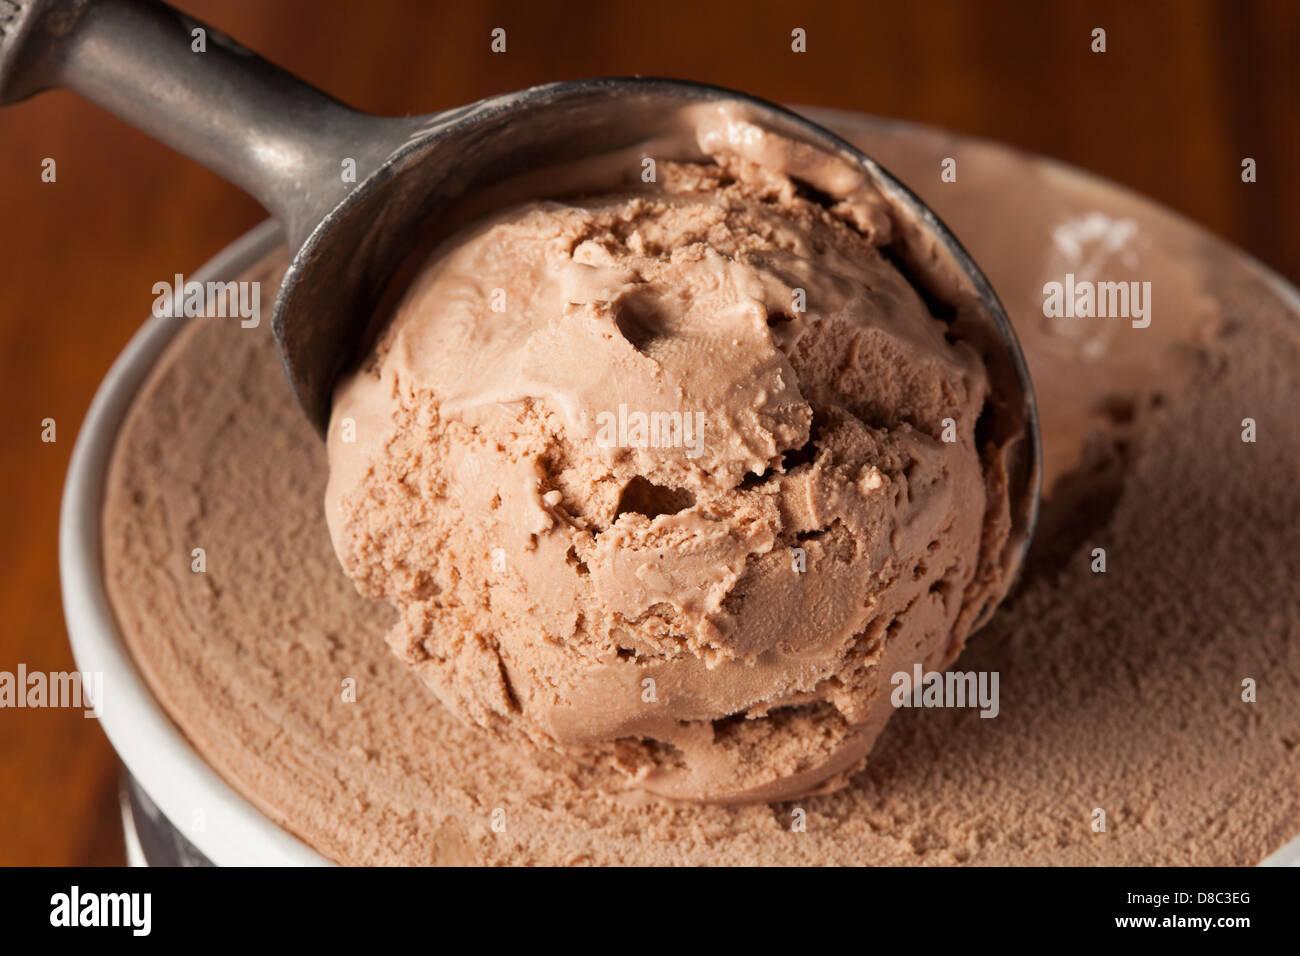 Bio froid glace chocolat sur un fond Photo Stock